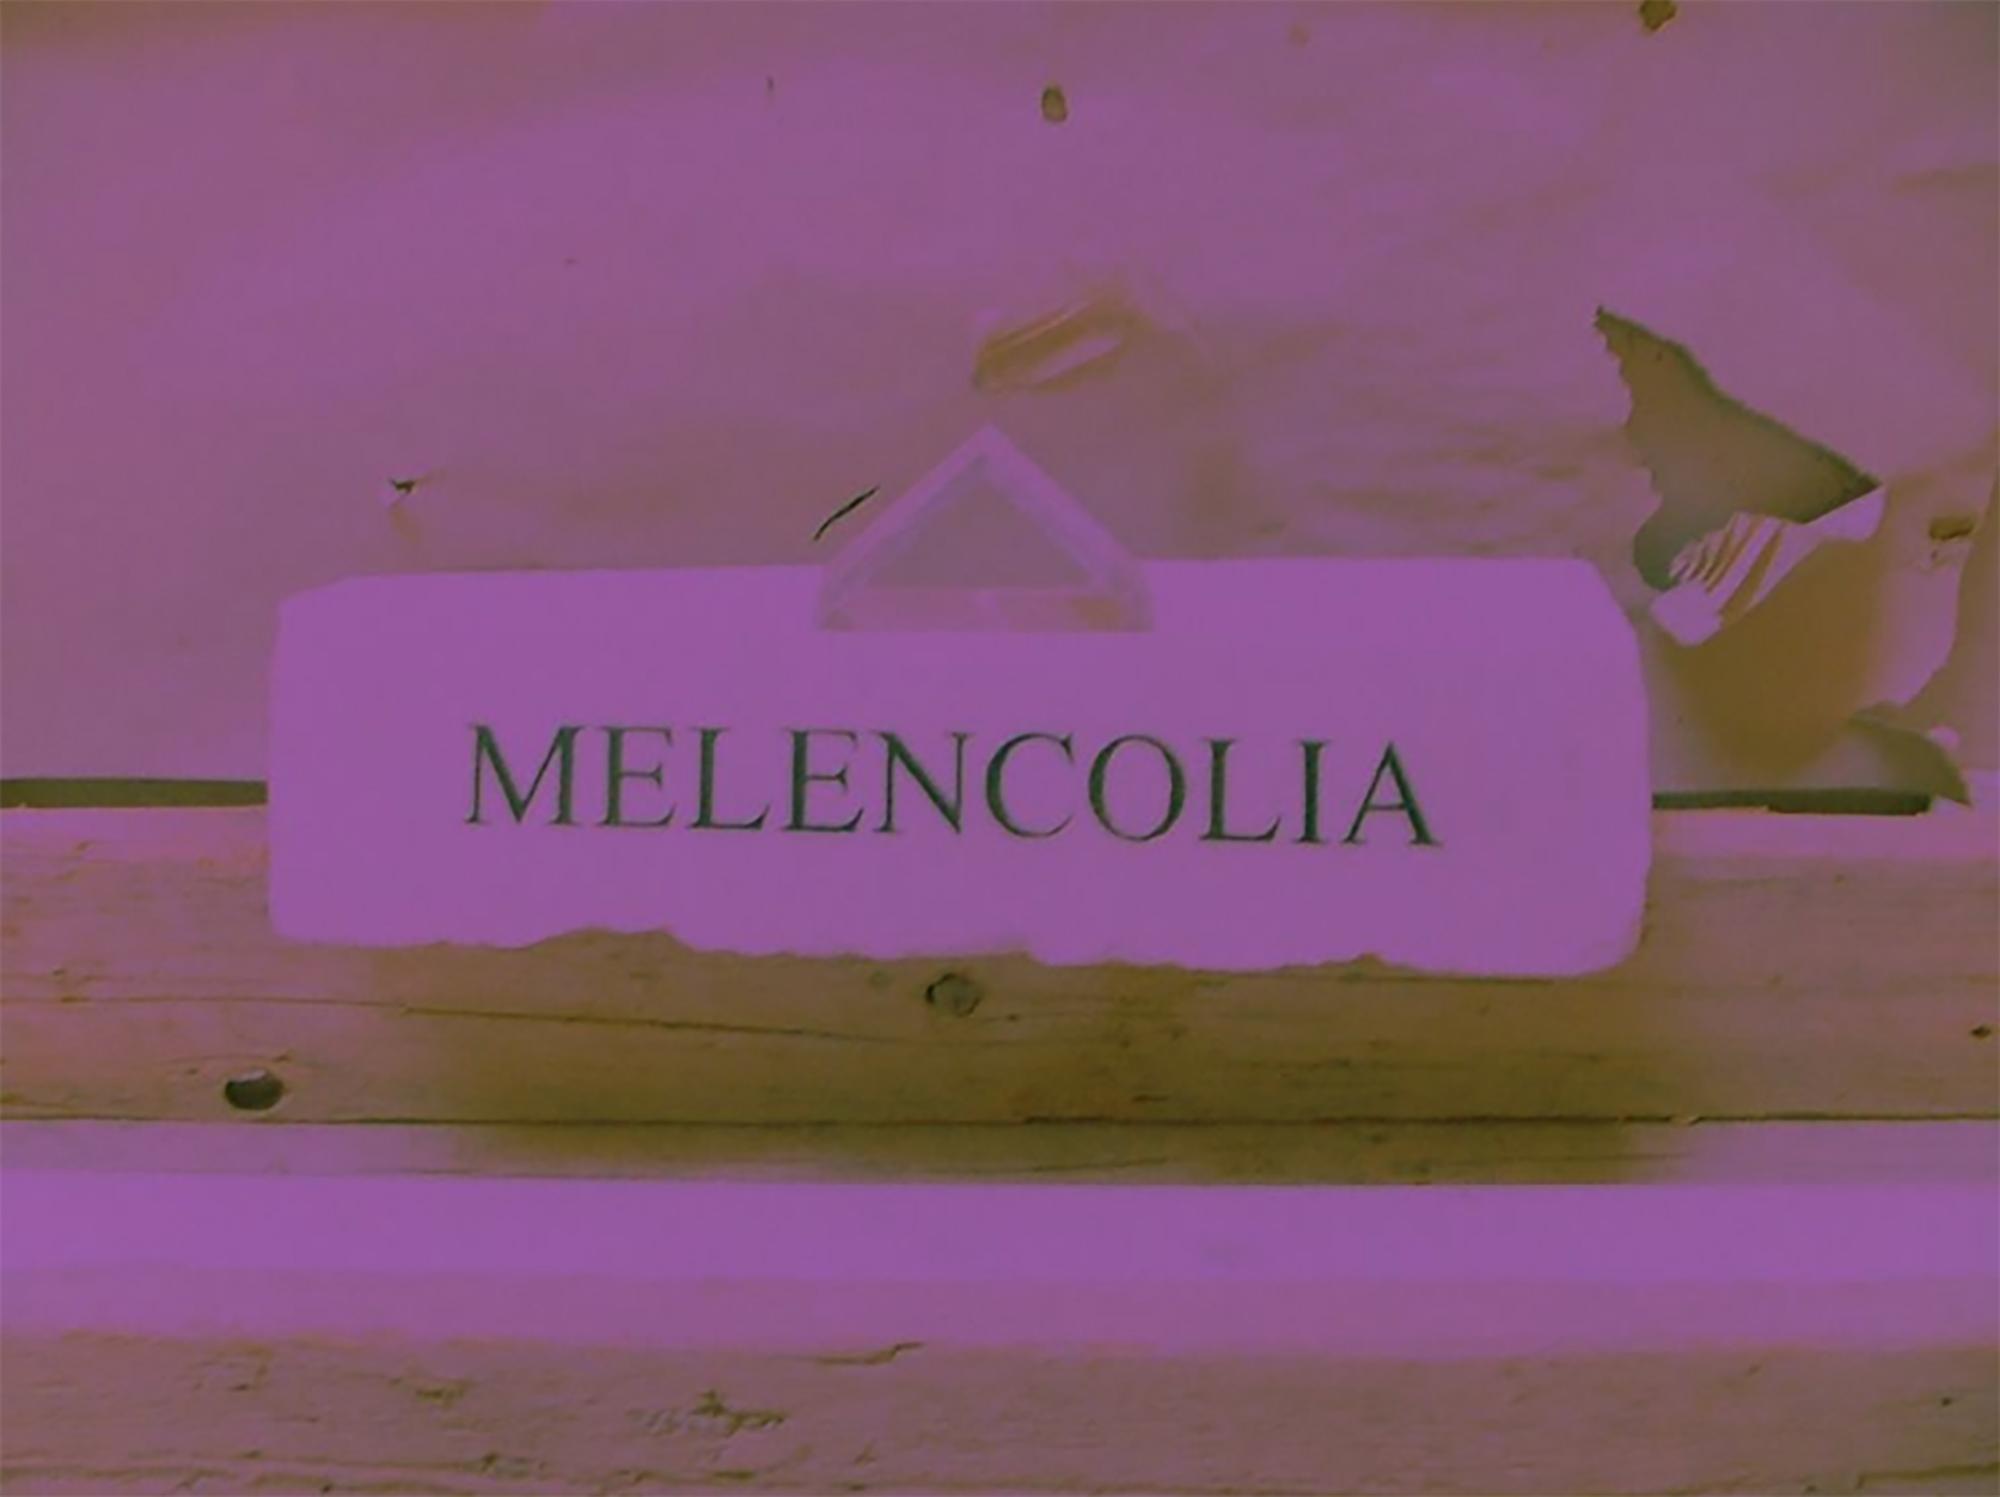 Panos Koulouras / Melencolia - Image 0